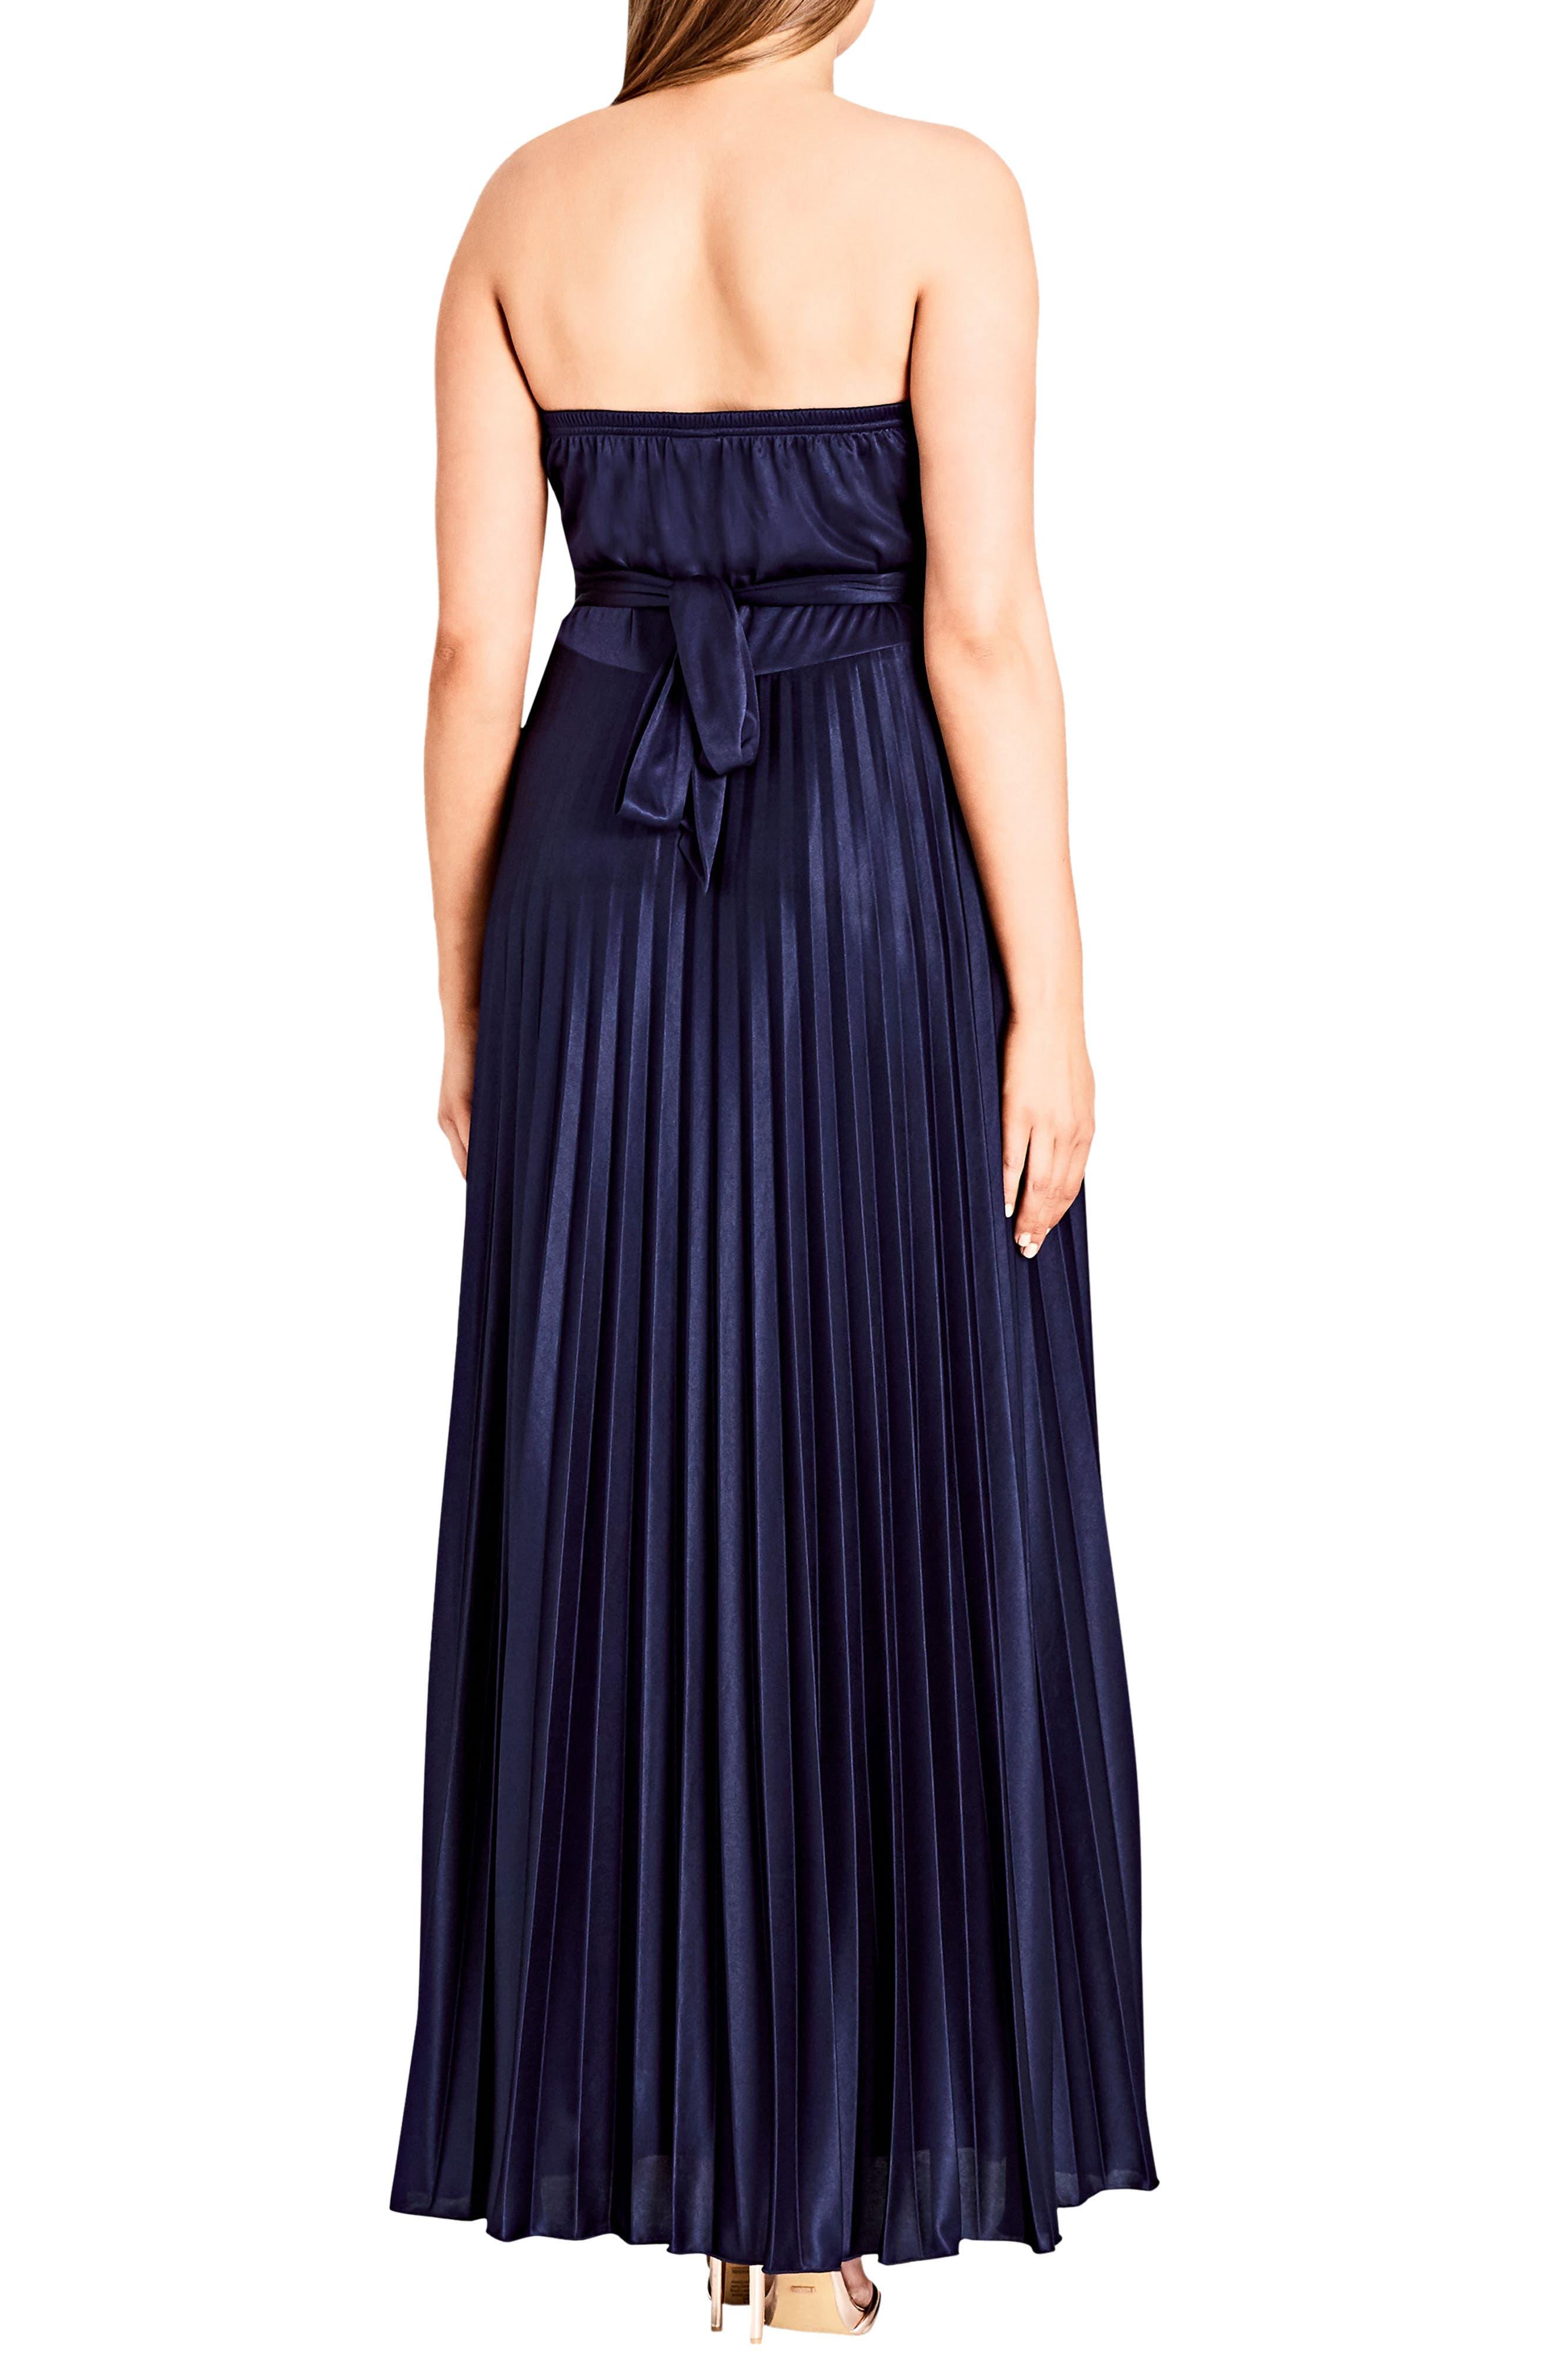 Helena Embellished Strapless Maxi Dress,                             Alternate thumbnail 2, color,                             NAVY